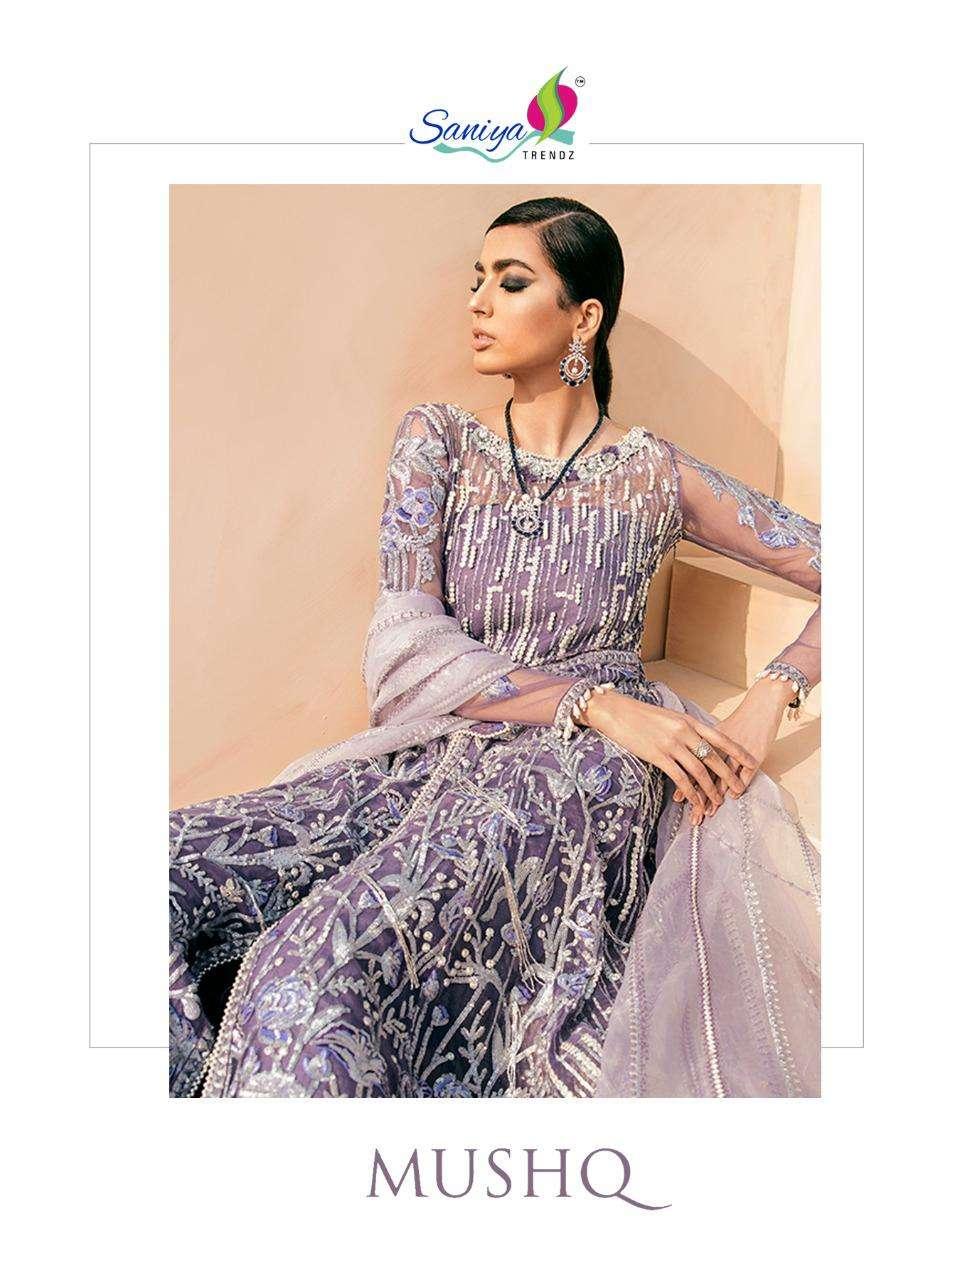 saniya trendz mushq butterfly net with embroidery pakistani designer suits